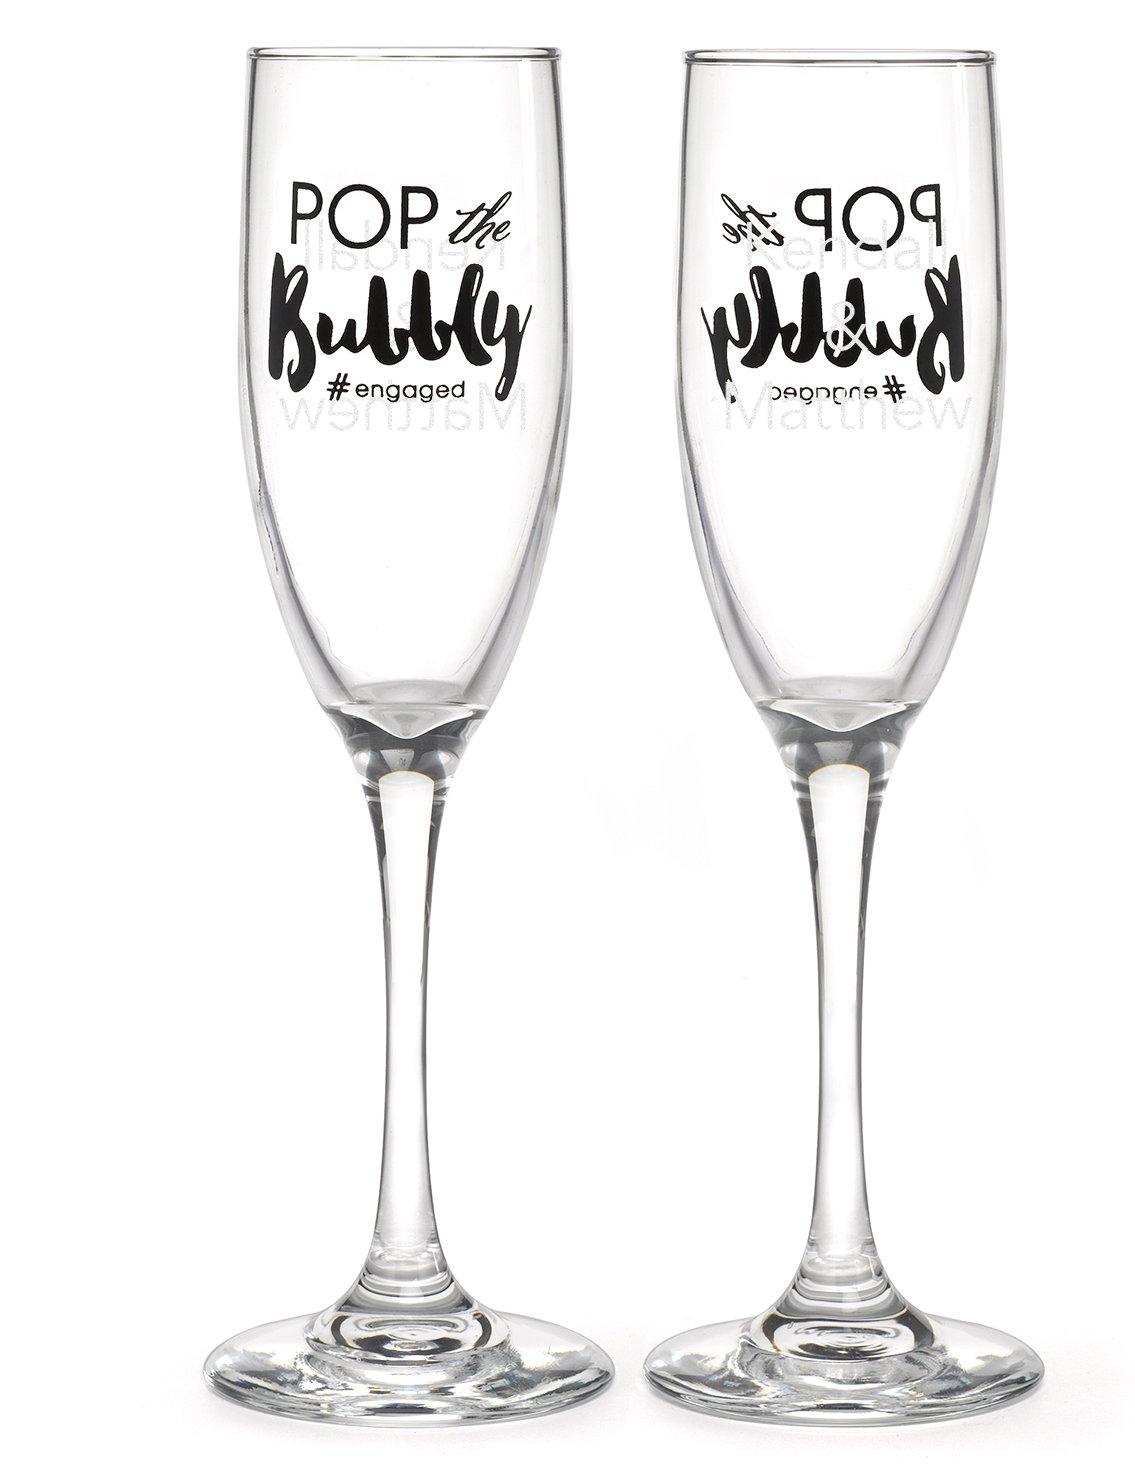 Hortense B. Hewitt 54873 Wedding Accessories, Champagne Toasting Flutes, #Engaged